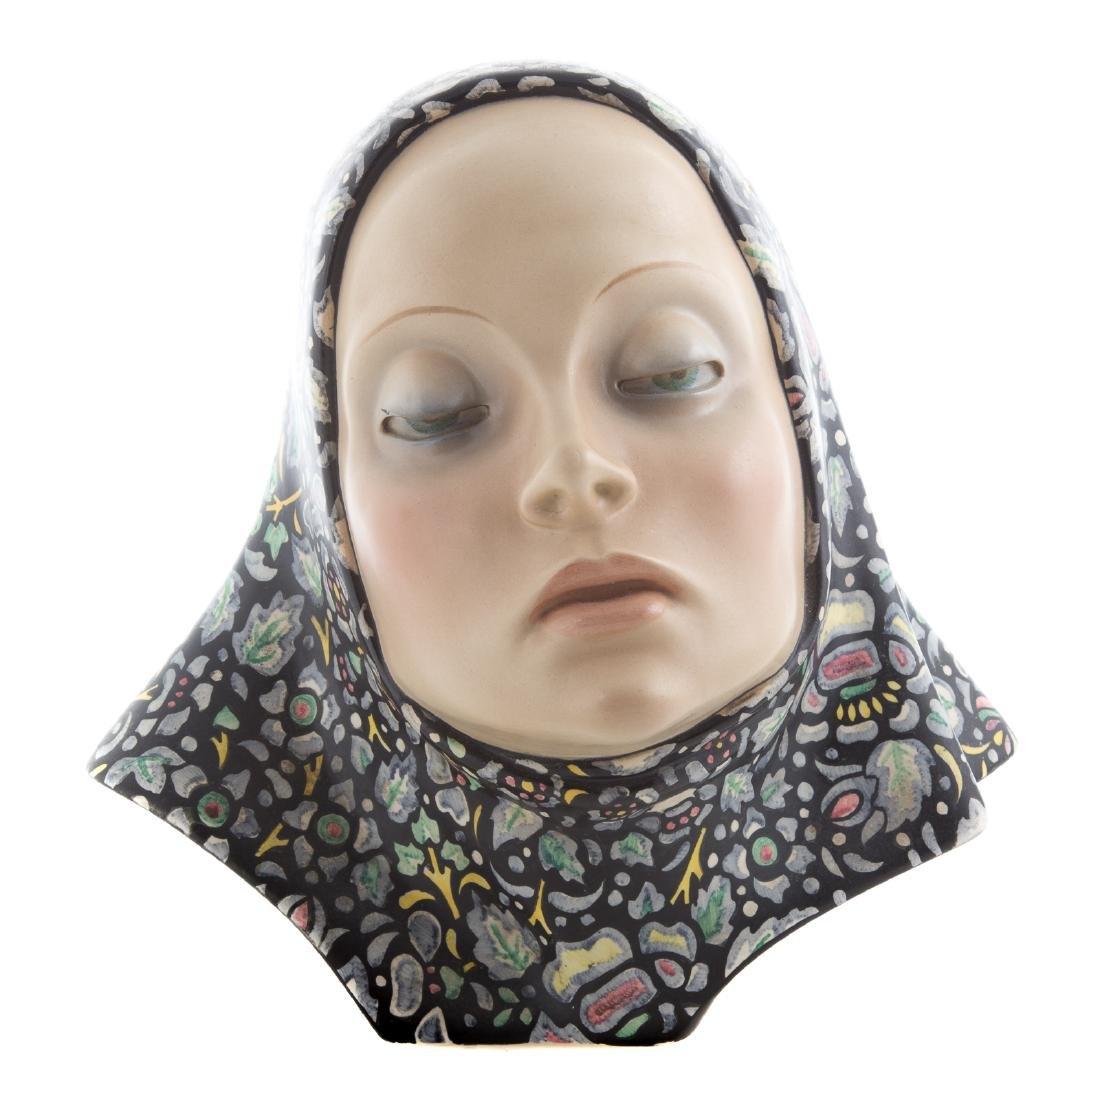 Lence glazed ceramic bust of woman